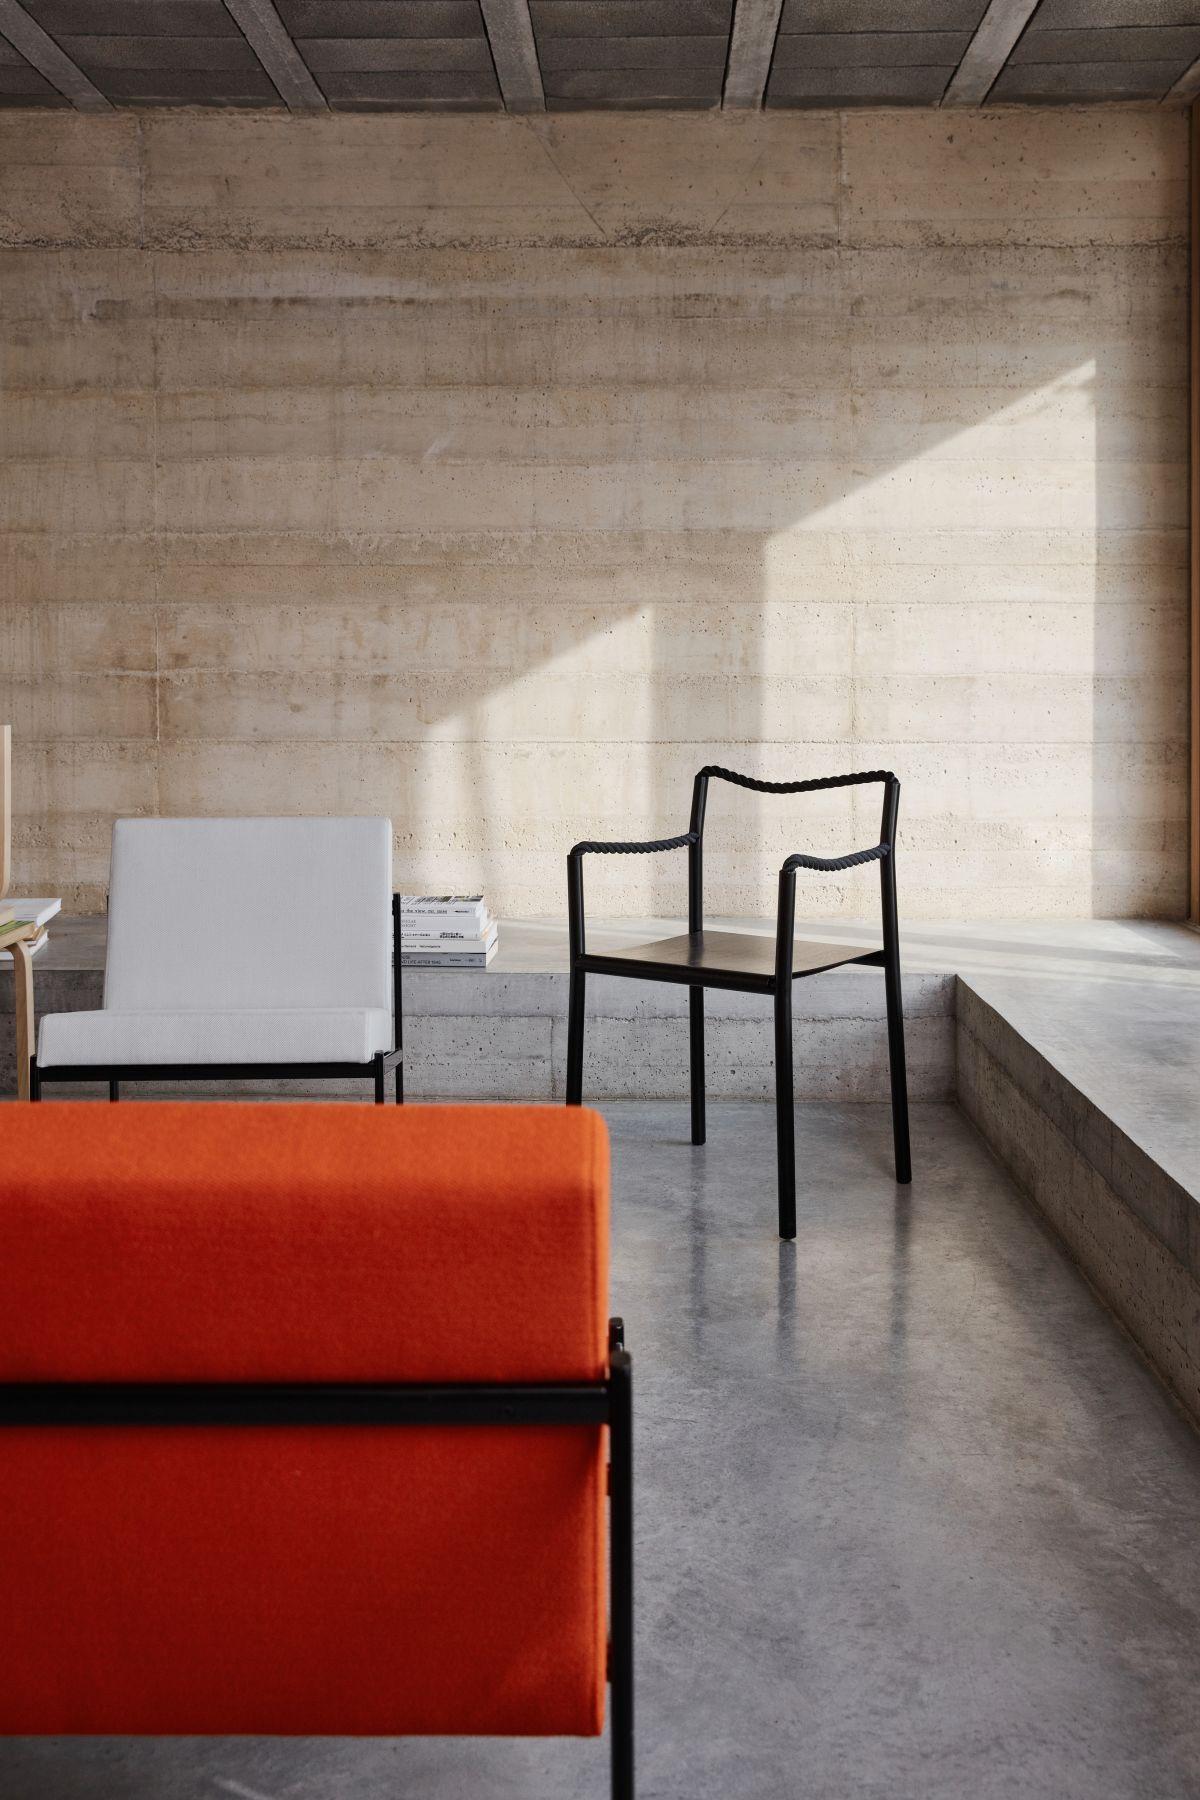 Rope_Chair_Kiki_Lounge_Chair_Mikko_Ryhanen_1-3192775